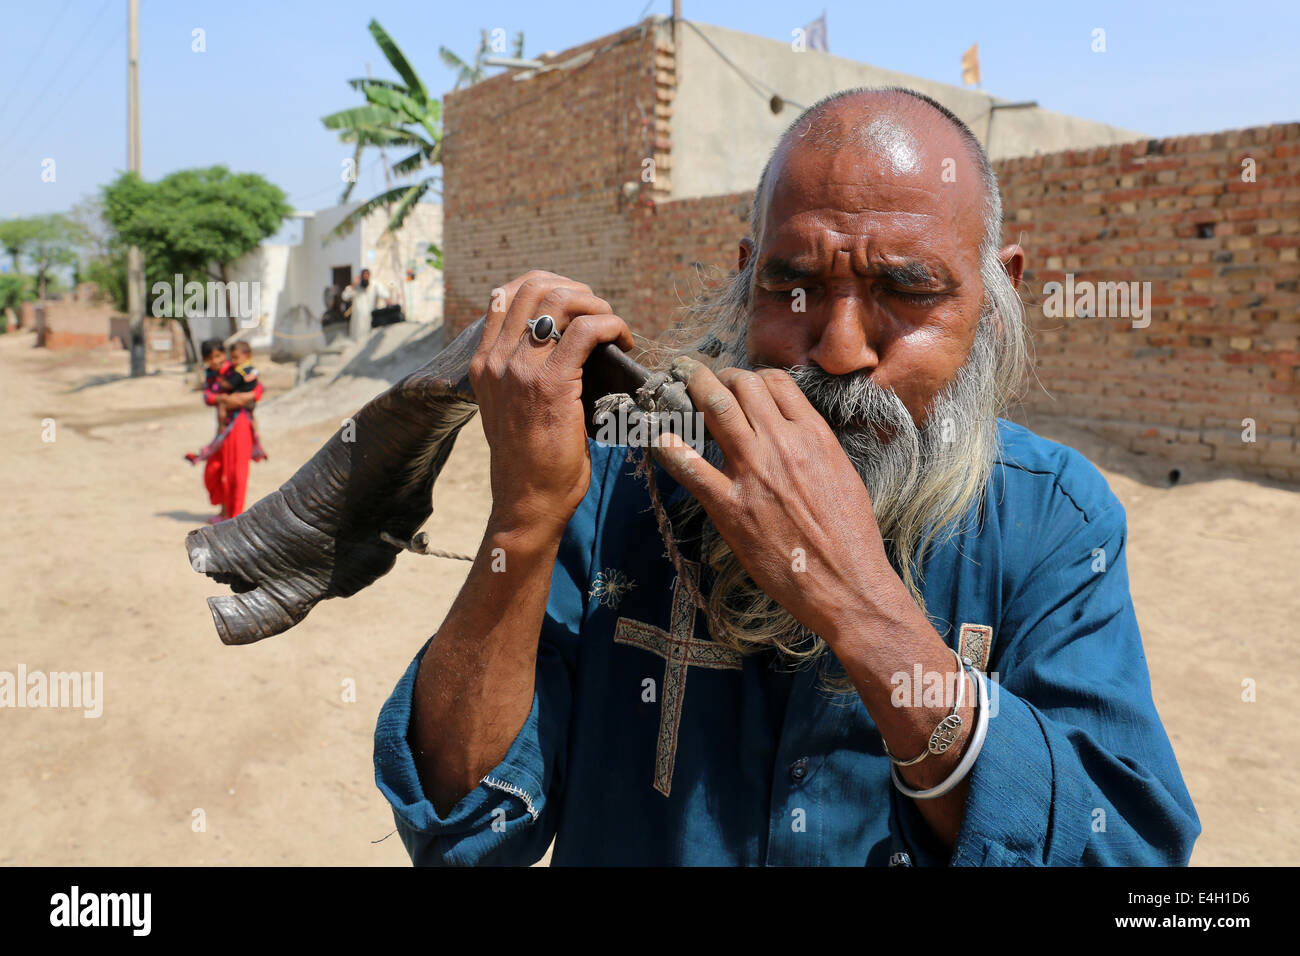 Man blowing on a goats horn, Khushpur village, Punjab, Pakistan - Stock Image